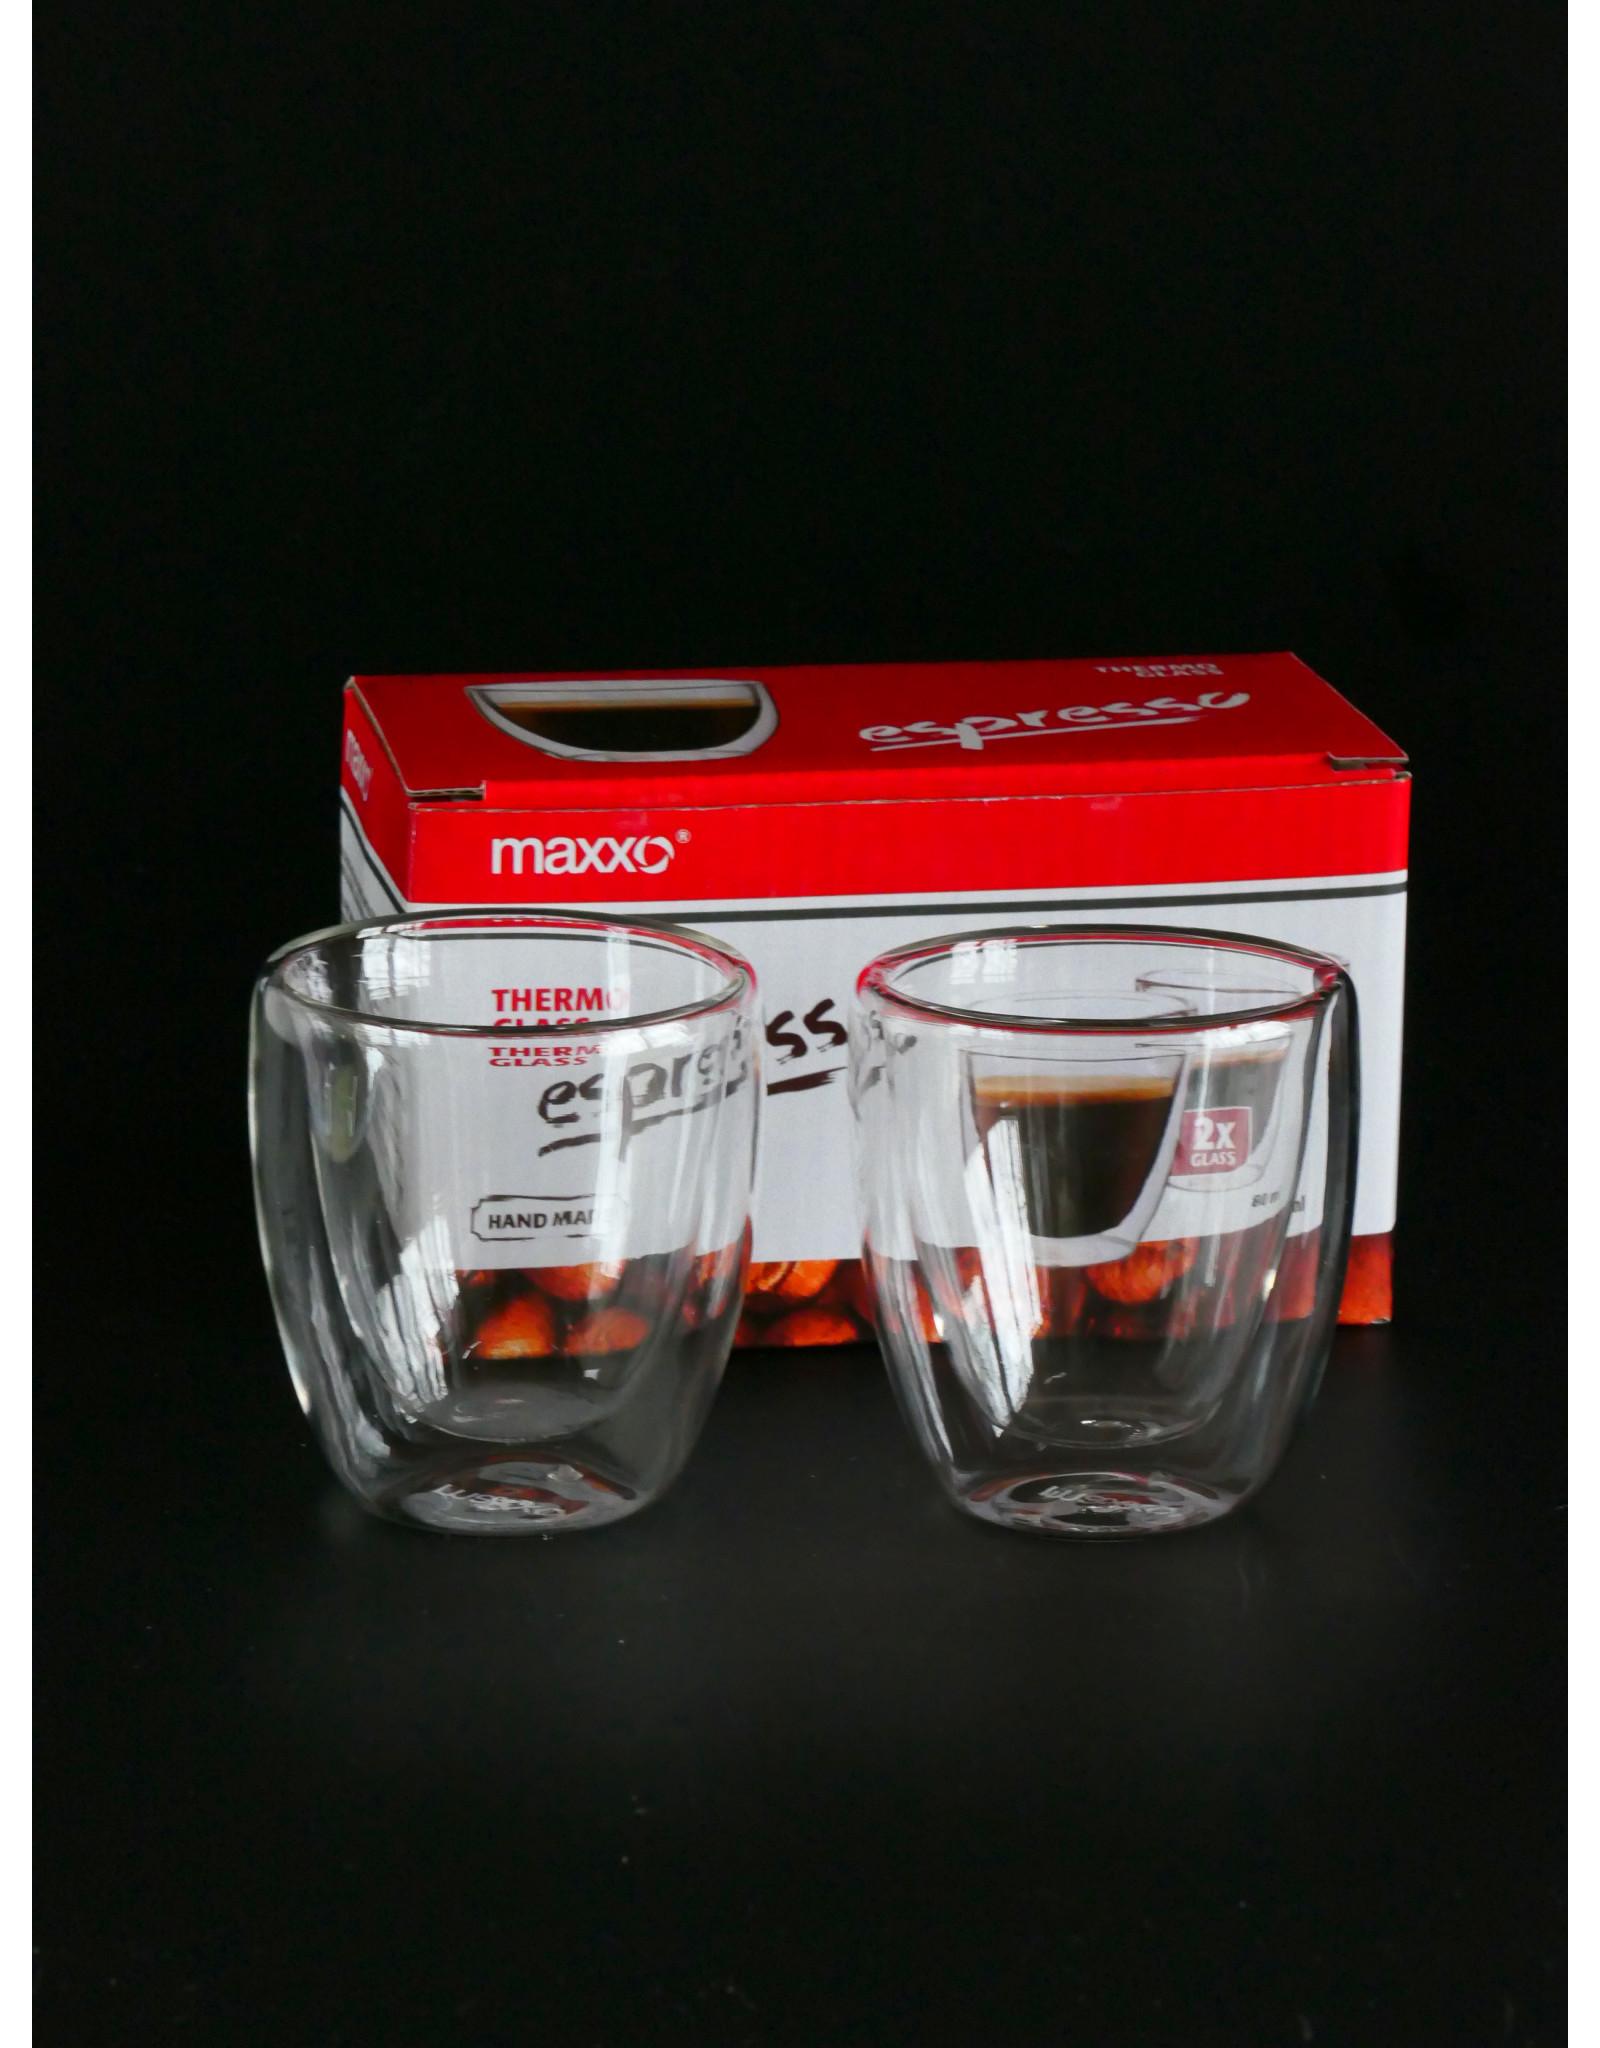 MAXXO MAXXO KLEINE ESPRESSO GLAZEN SET 2 STUKS